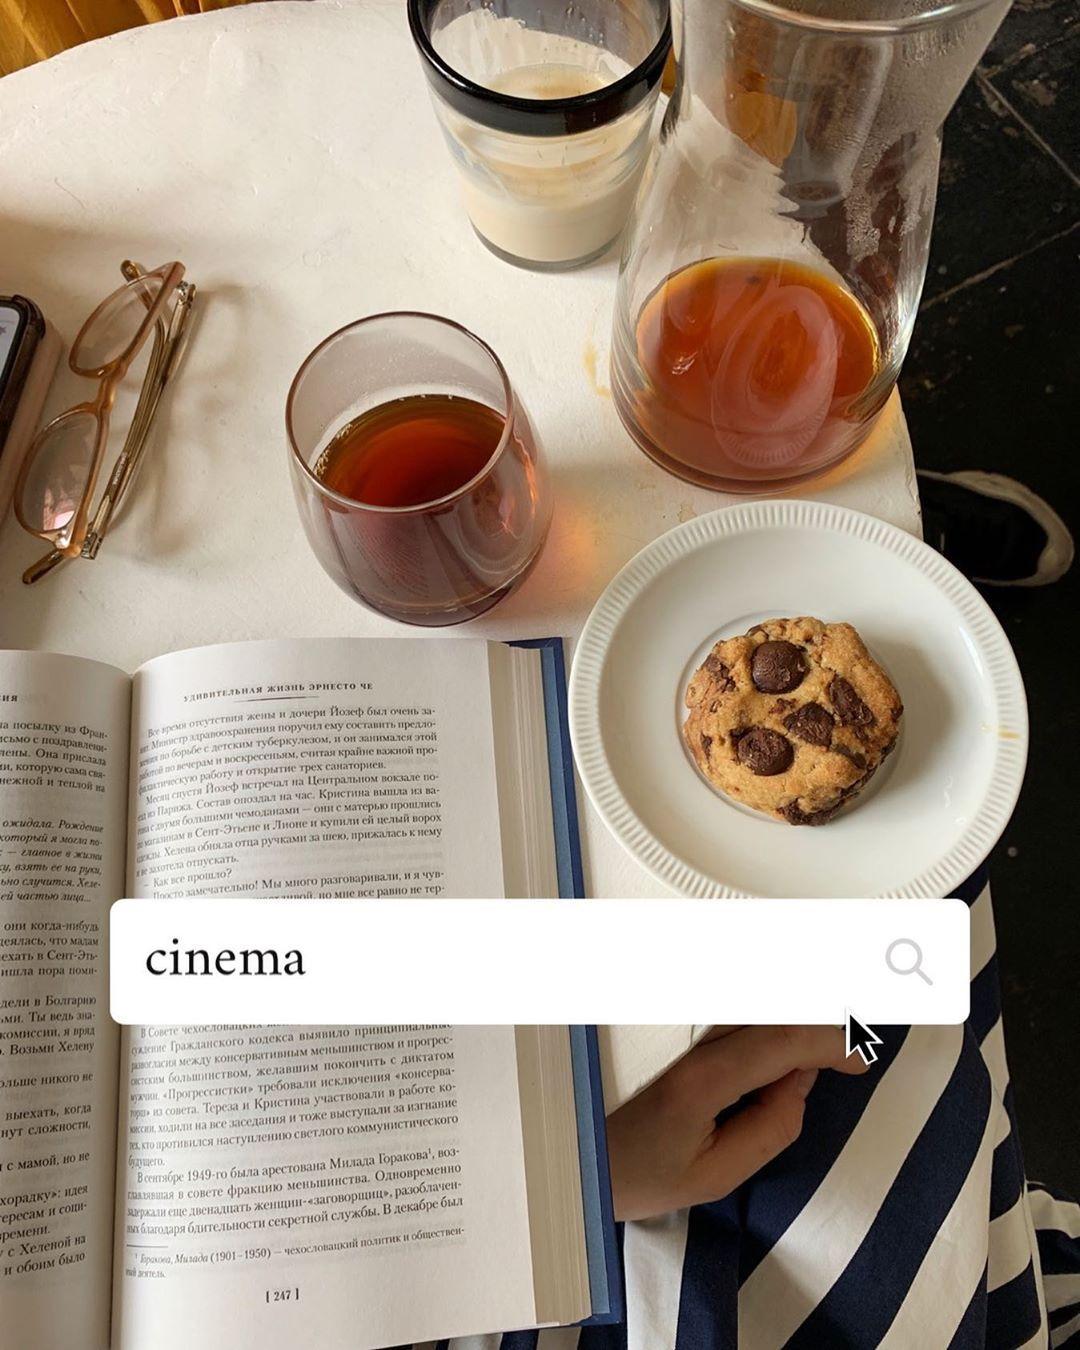 ma beauté | Еда и напитки, Инстаграм